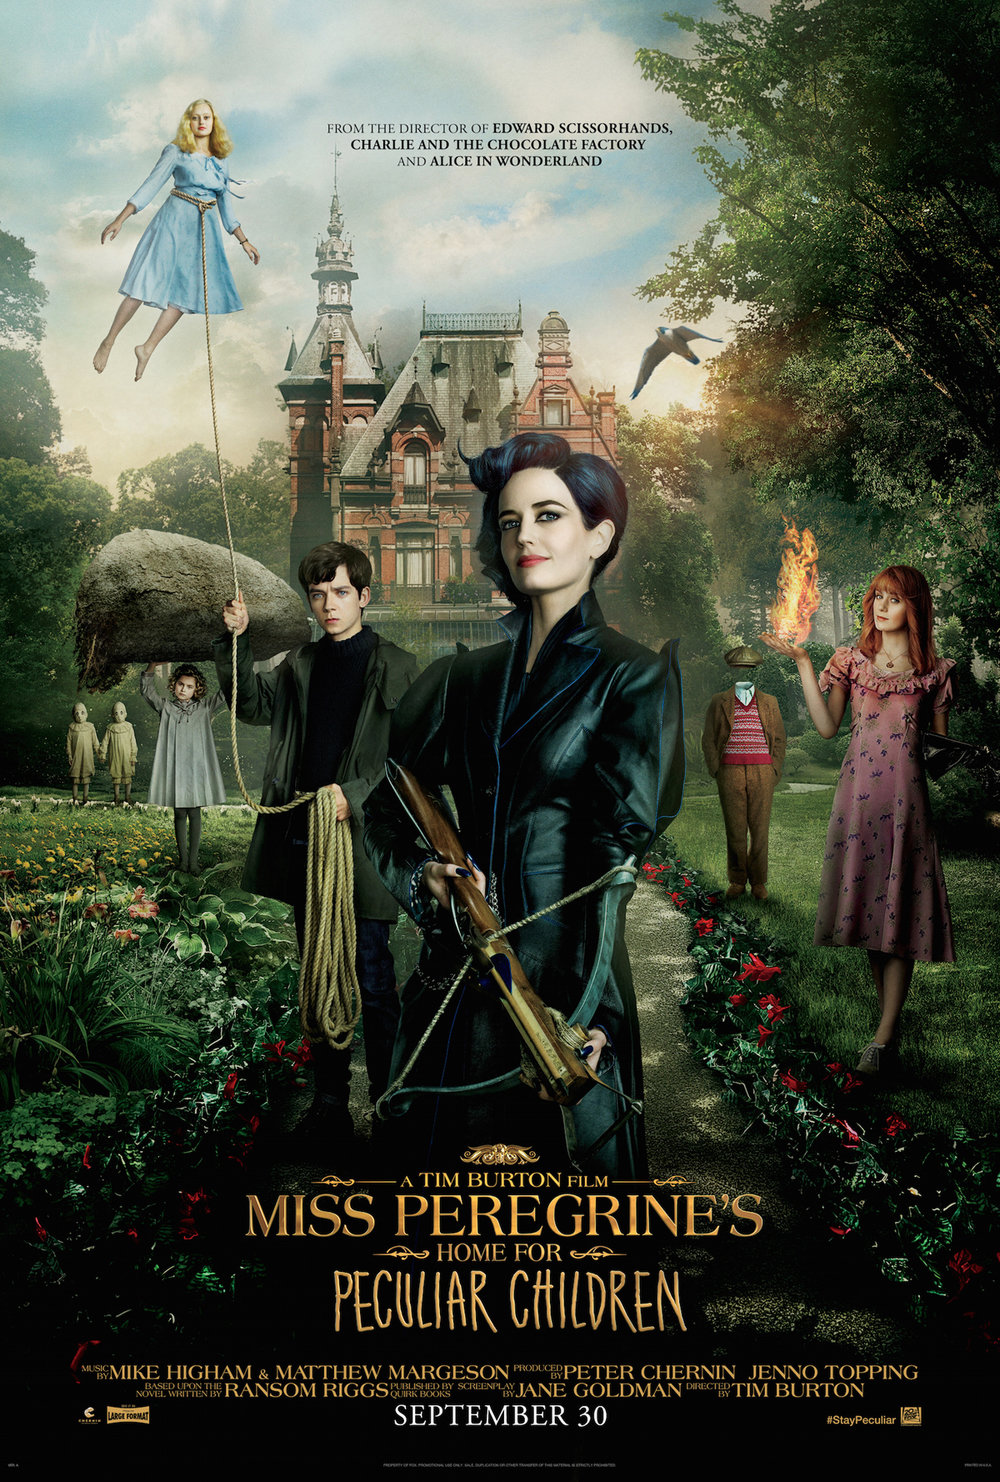 http://www.3dor2d.com/reviews/miss-peregrines-home-for-peculiar-children